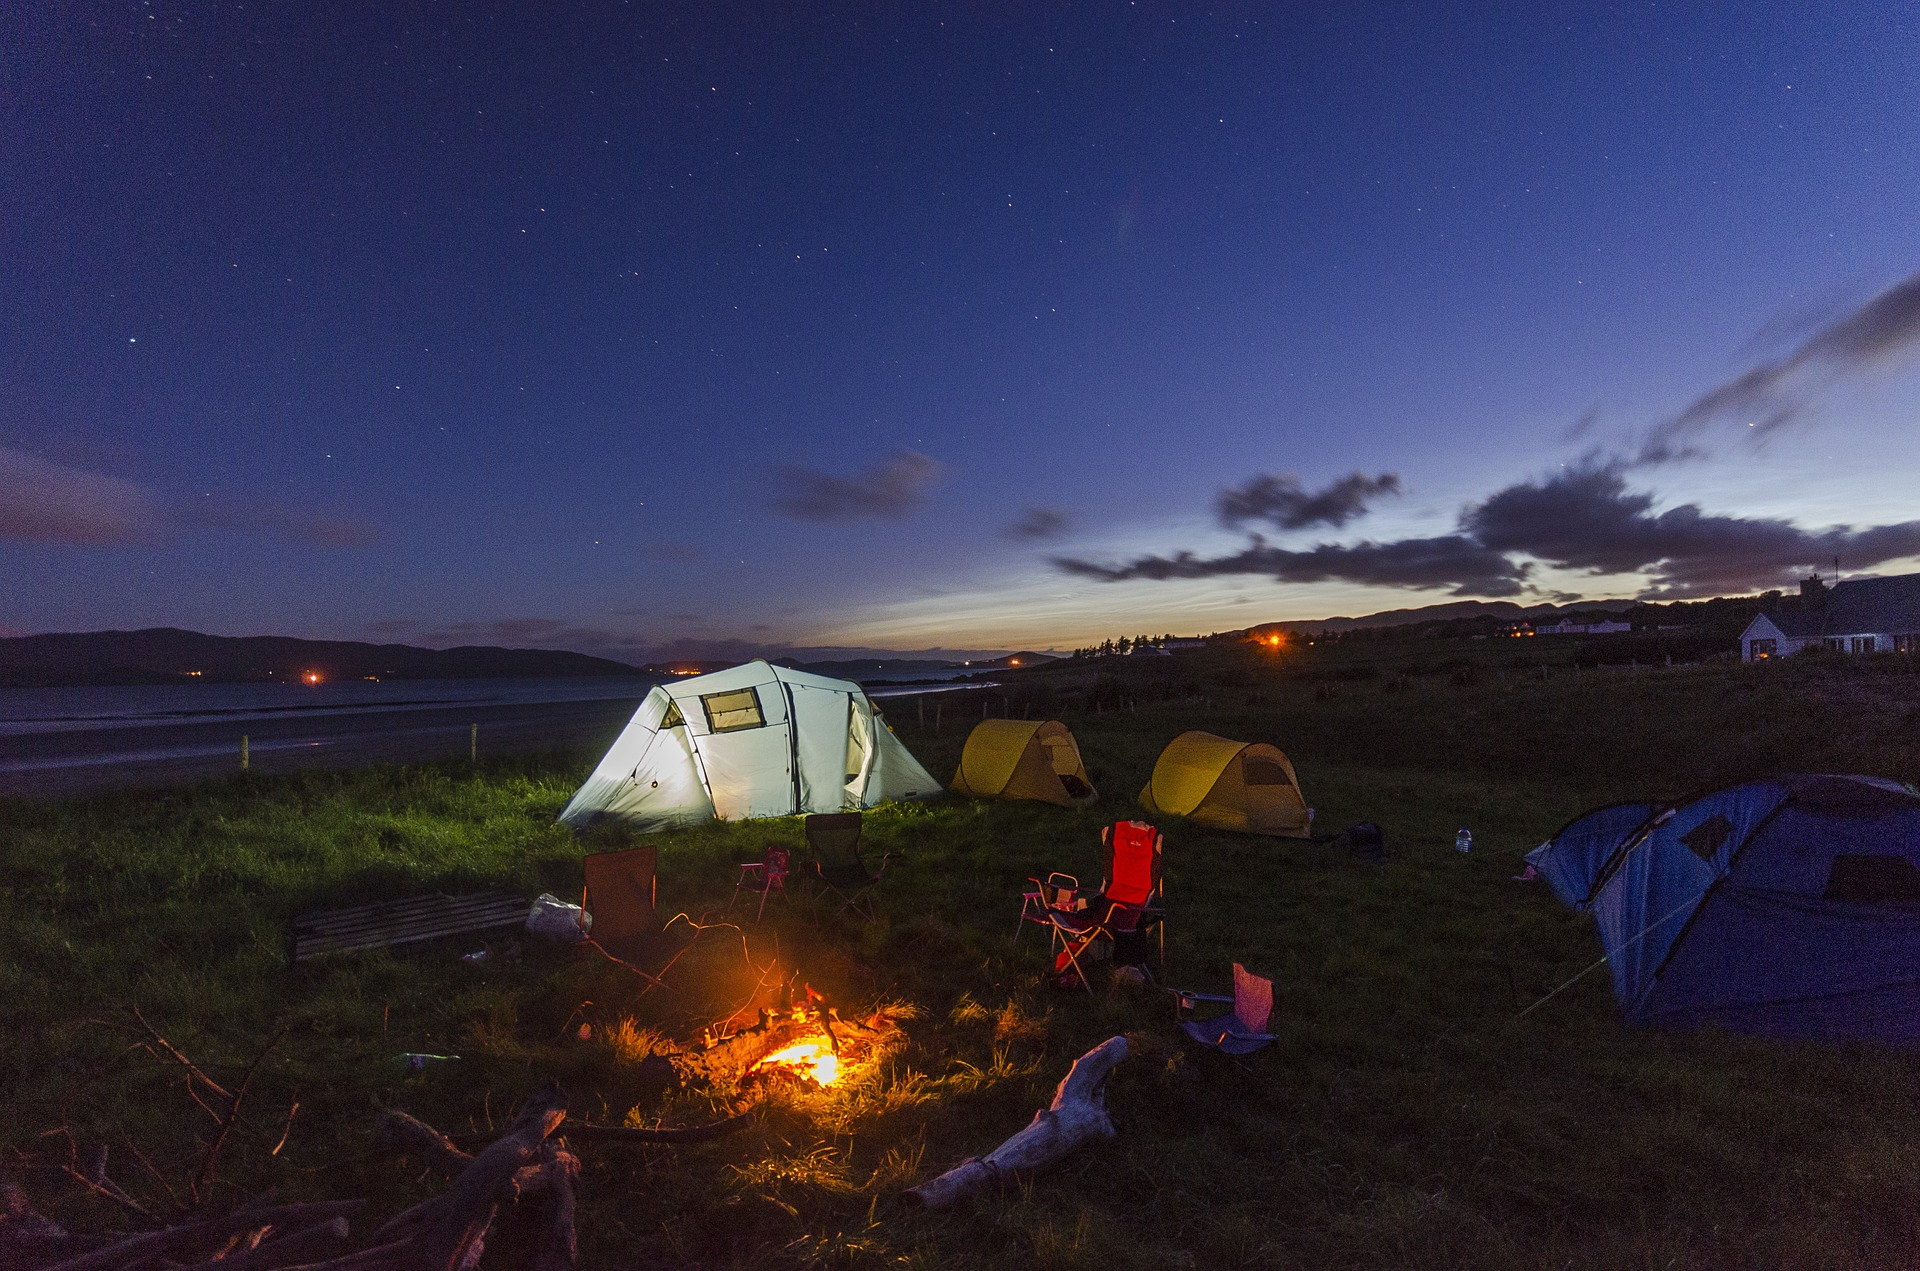 Comment bien dormir en camping